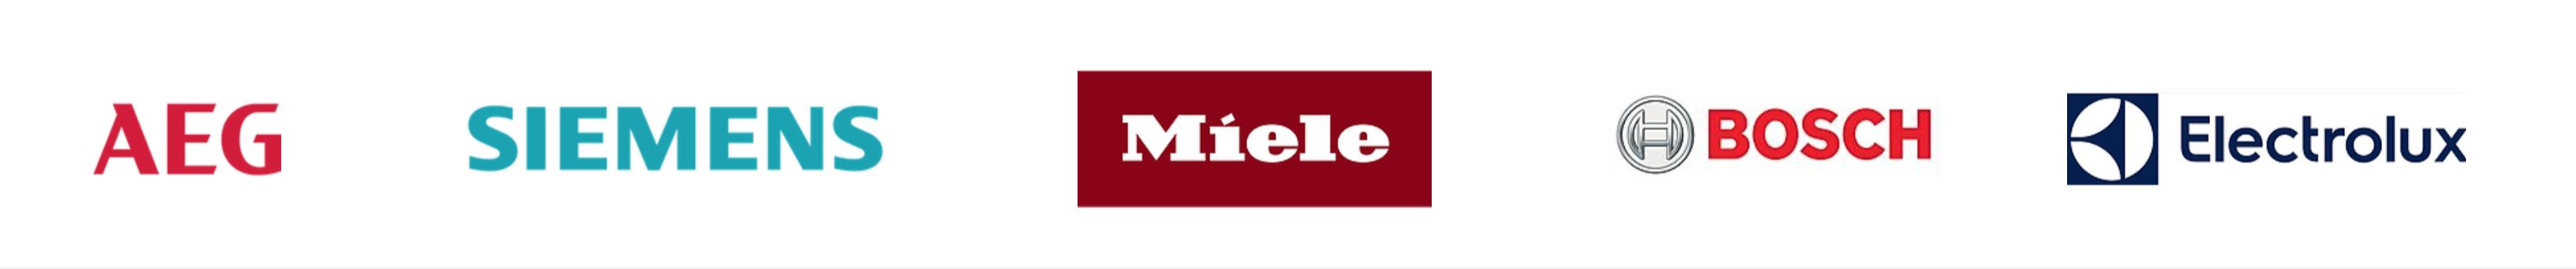 Kurzy vaření AEG Siemens Miele Bosch Electrolux